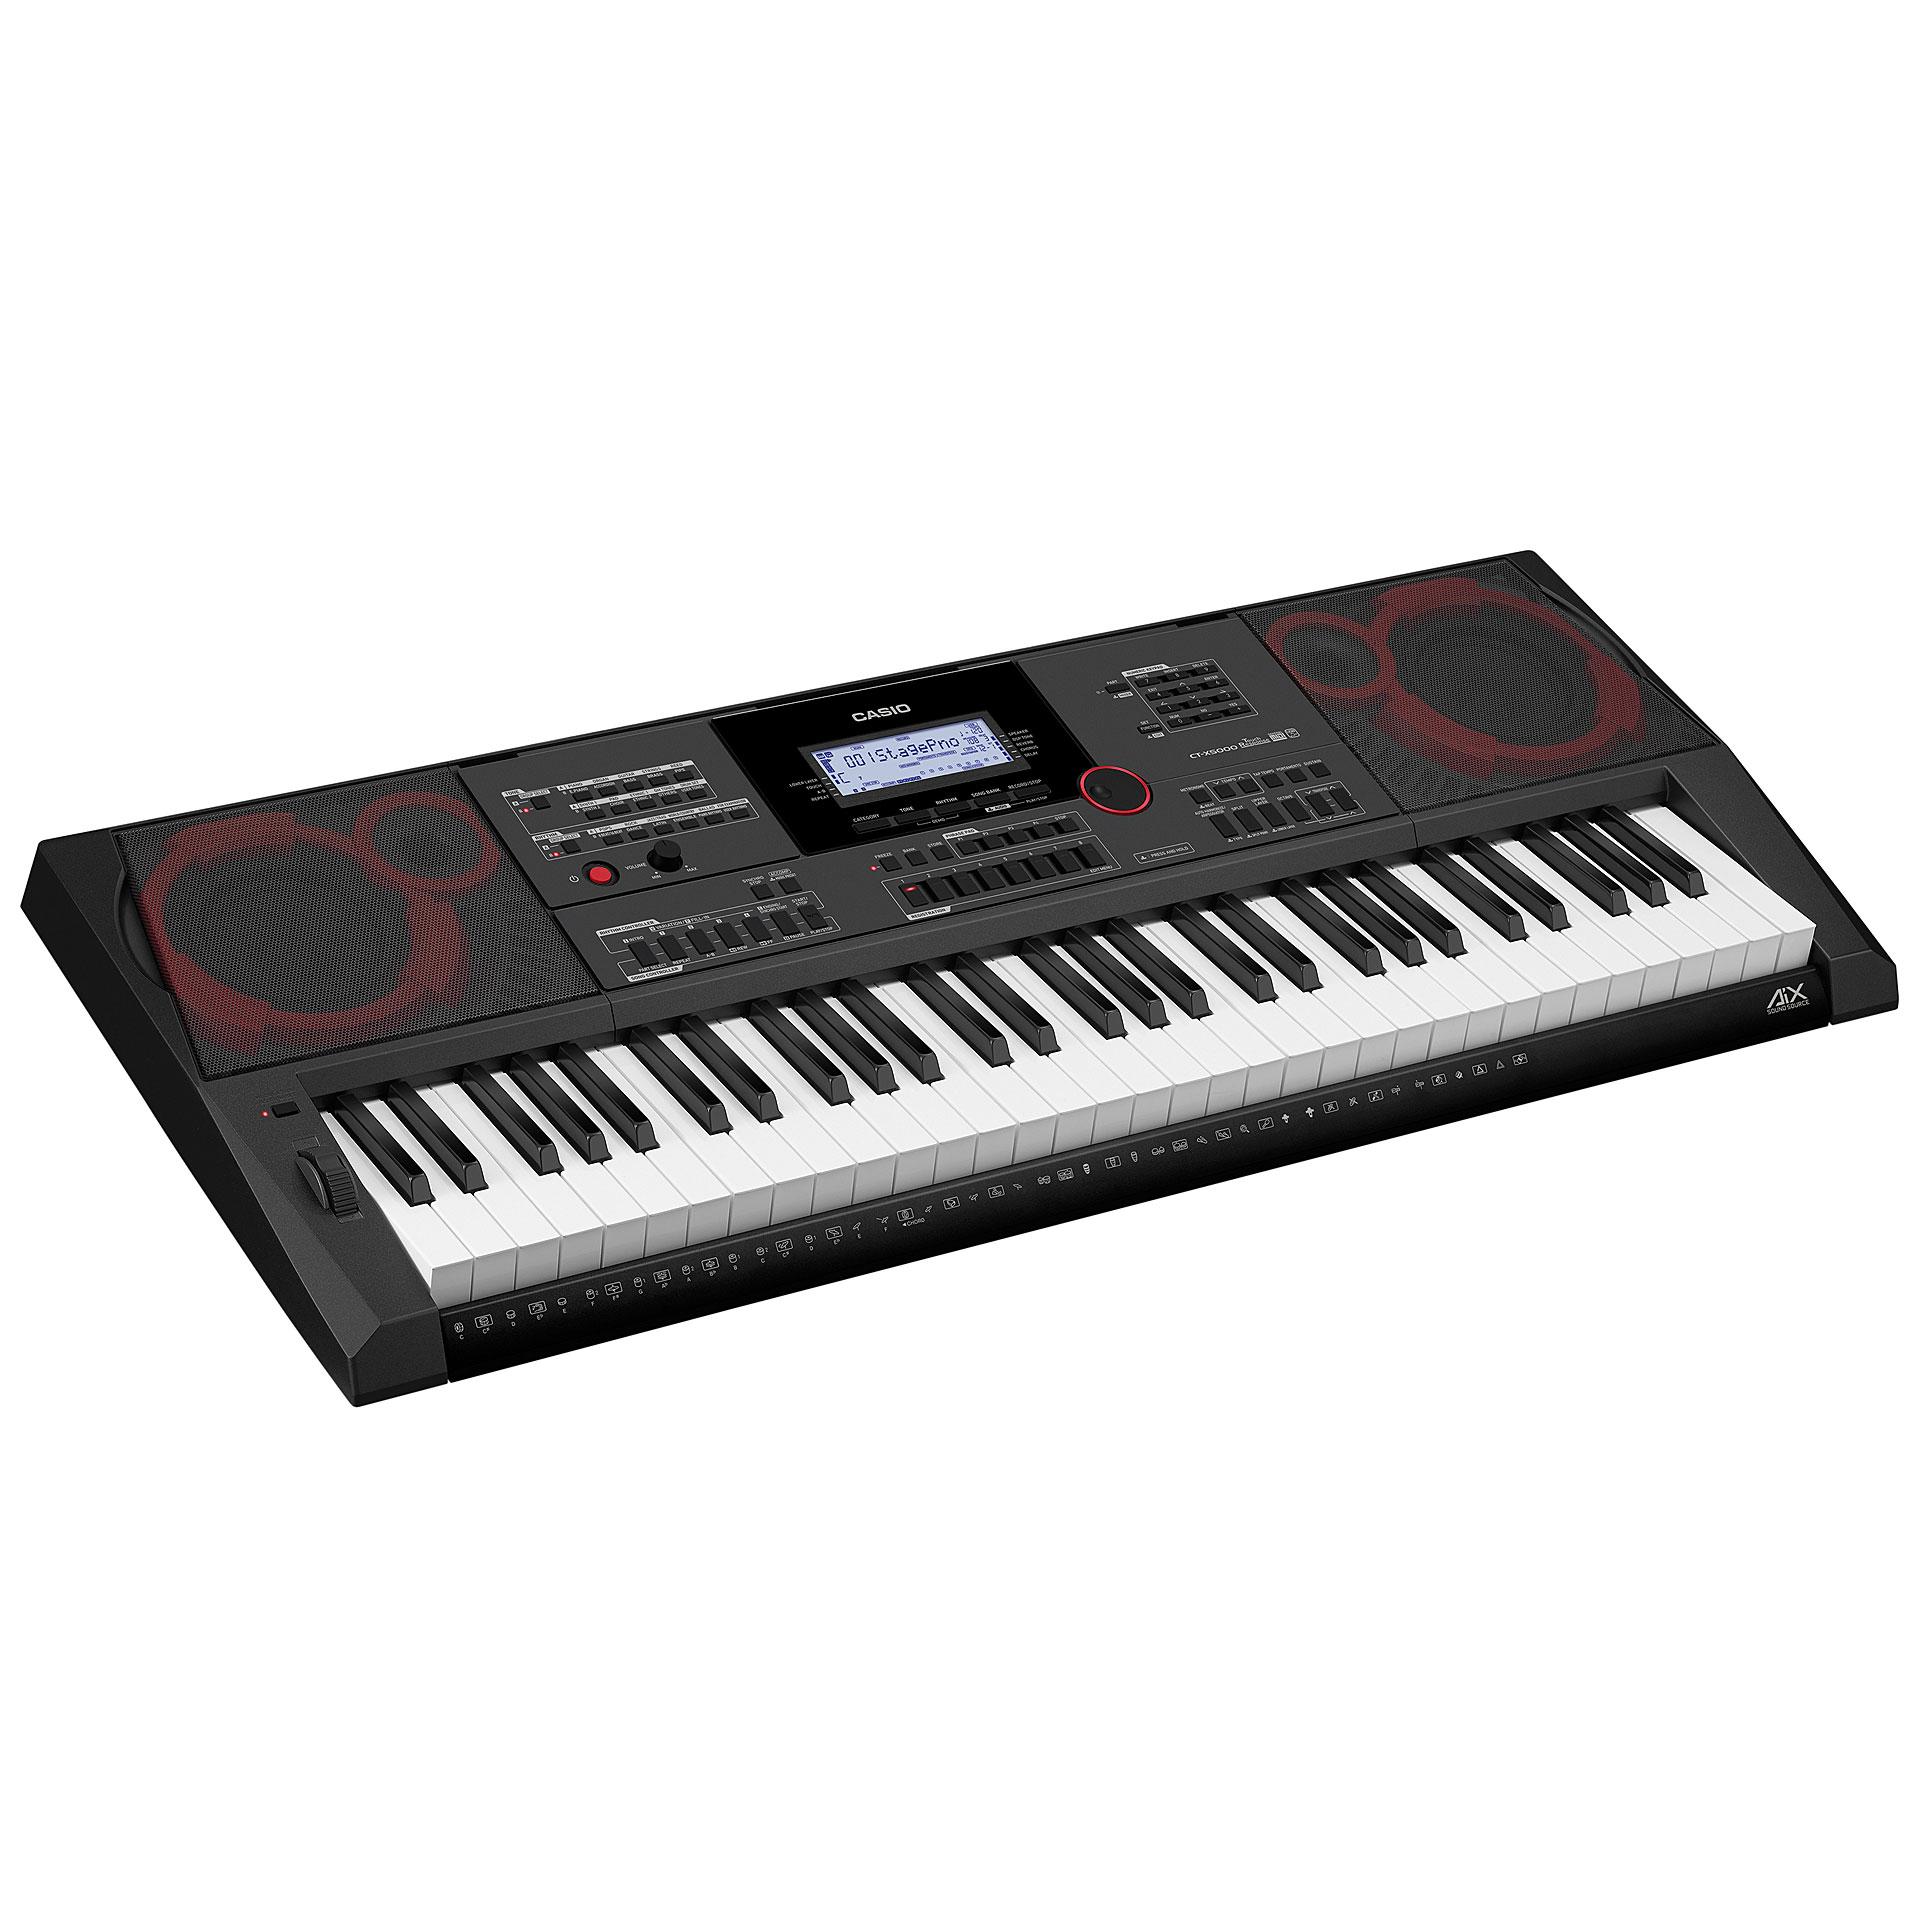 casio ct x5000  u00ab keyboard eclipse mp3 player instruction manual sony walkman mp3 player instruction manual